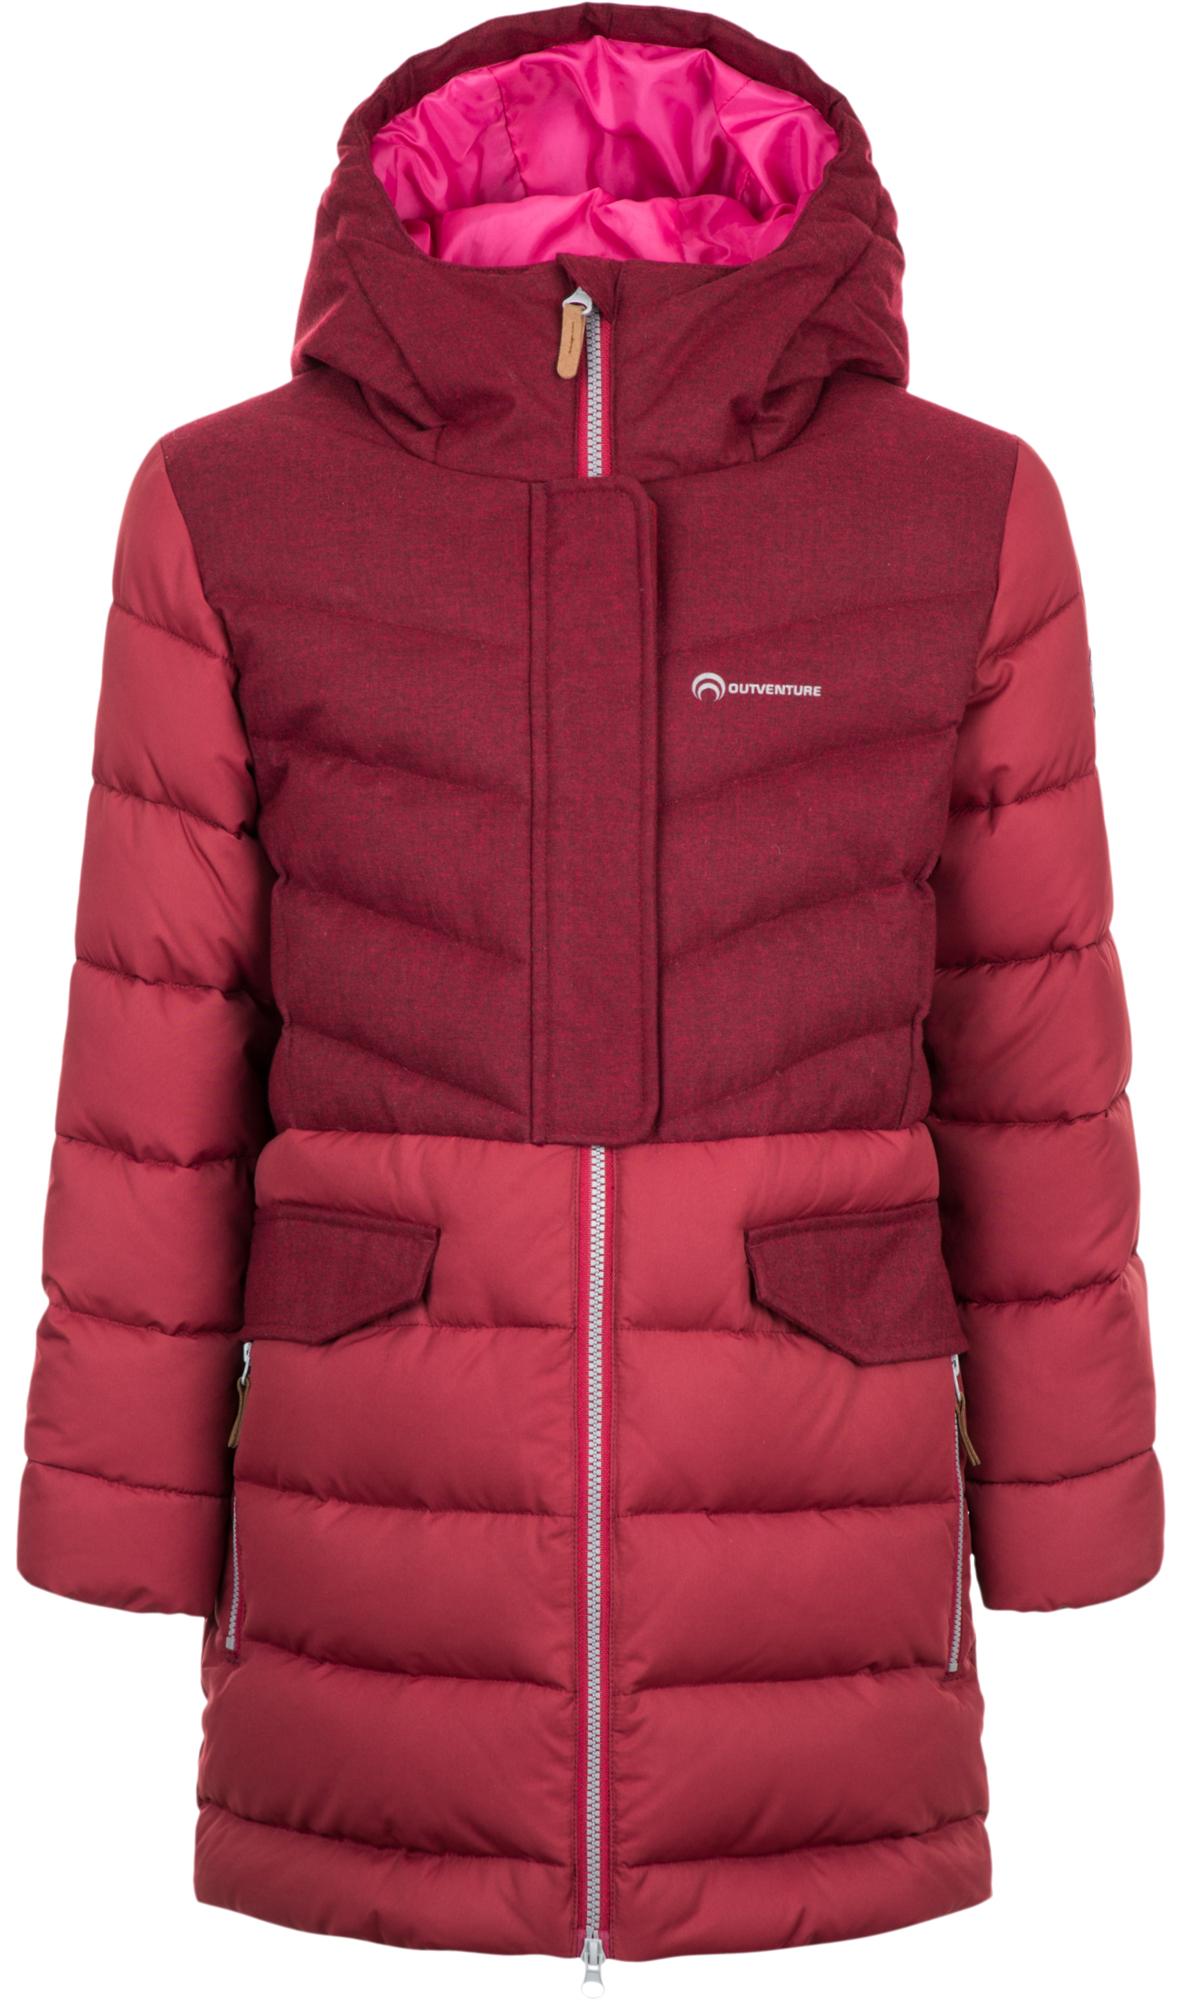 Outventure Куртка пуховая для девочек Outventure, размер 158